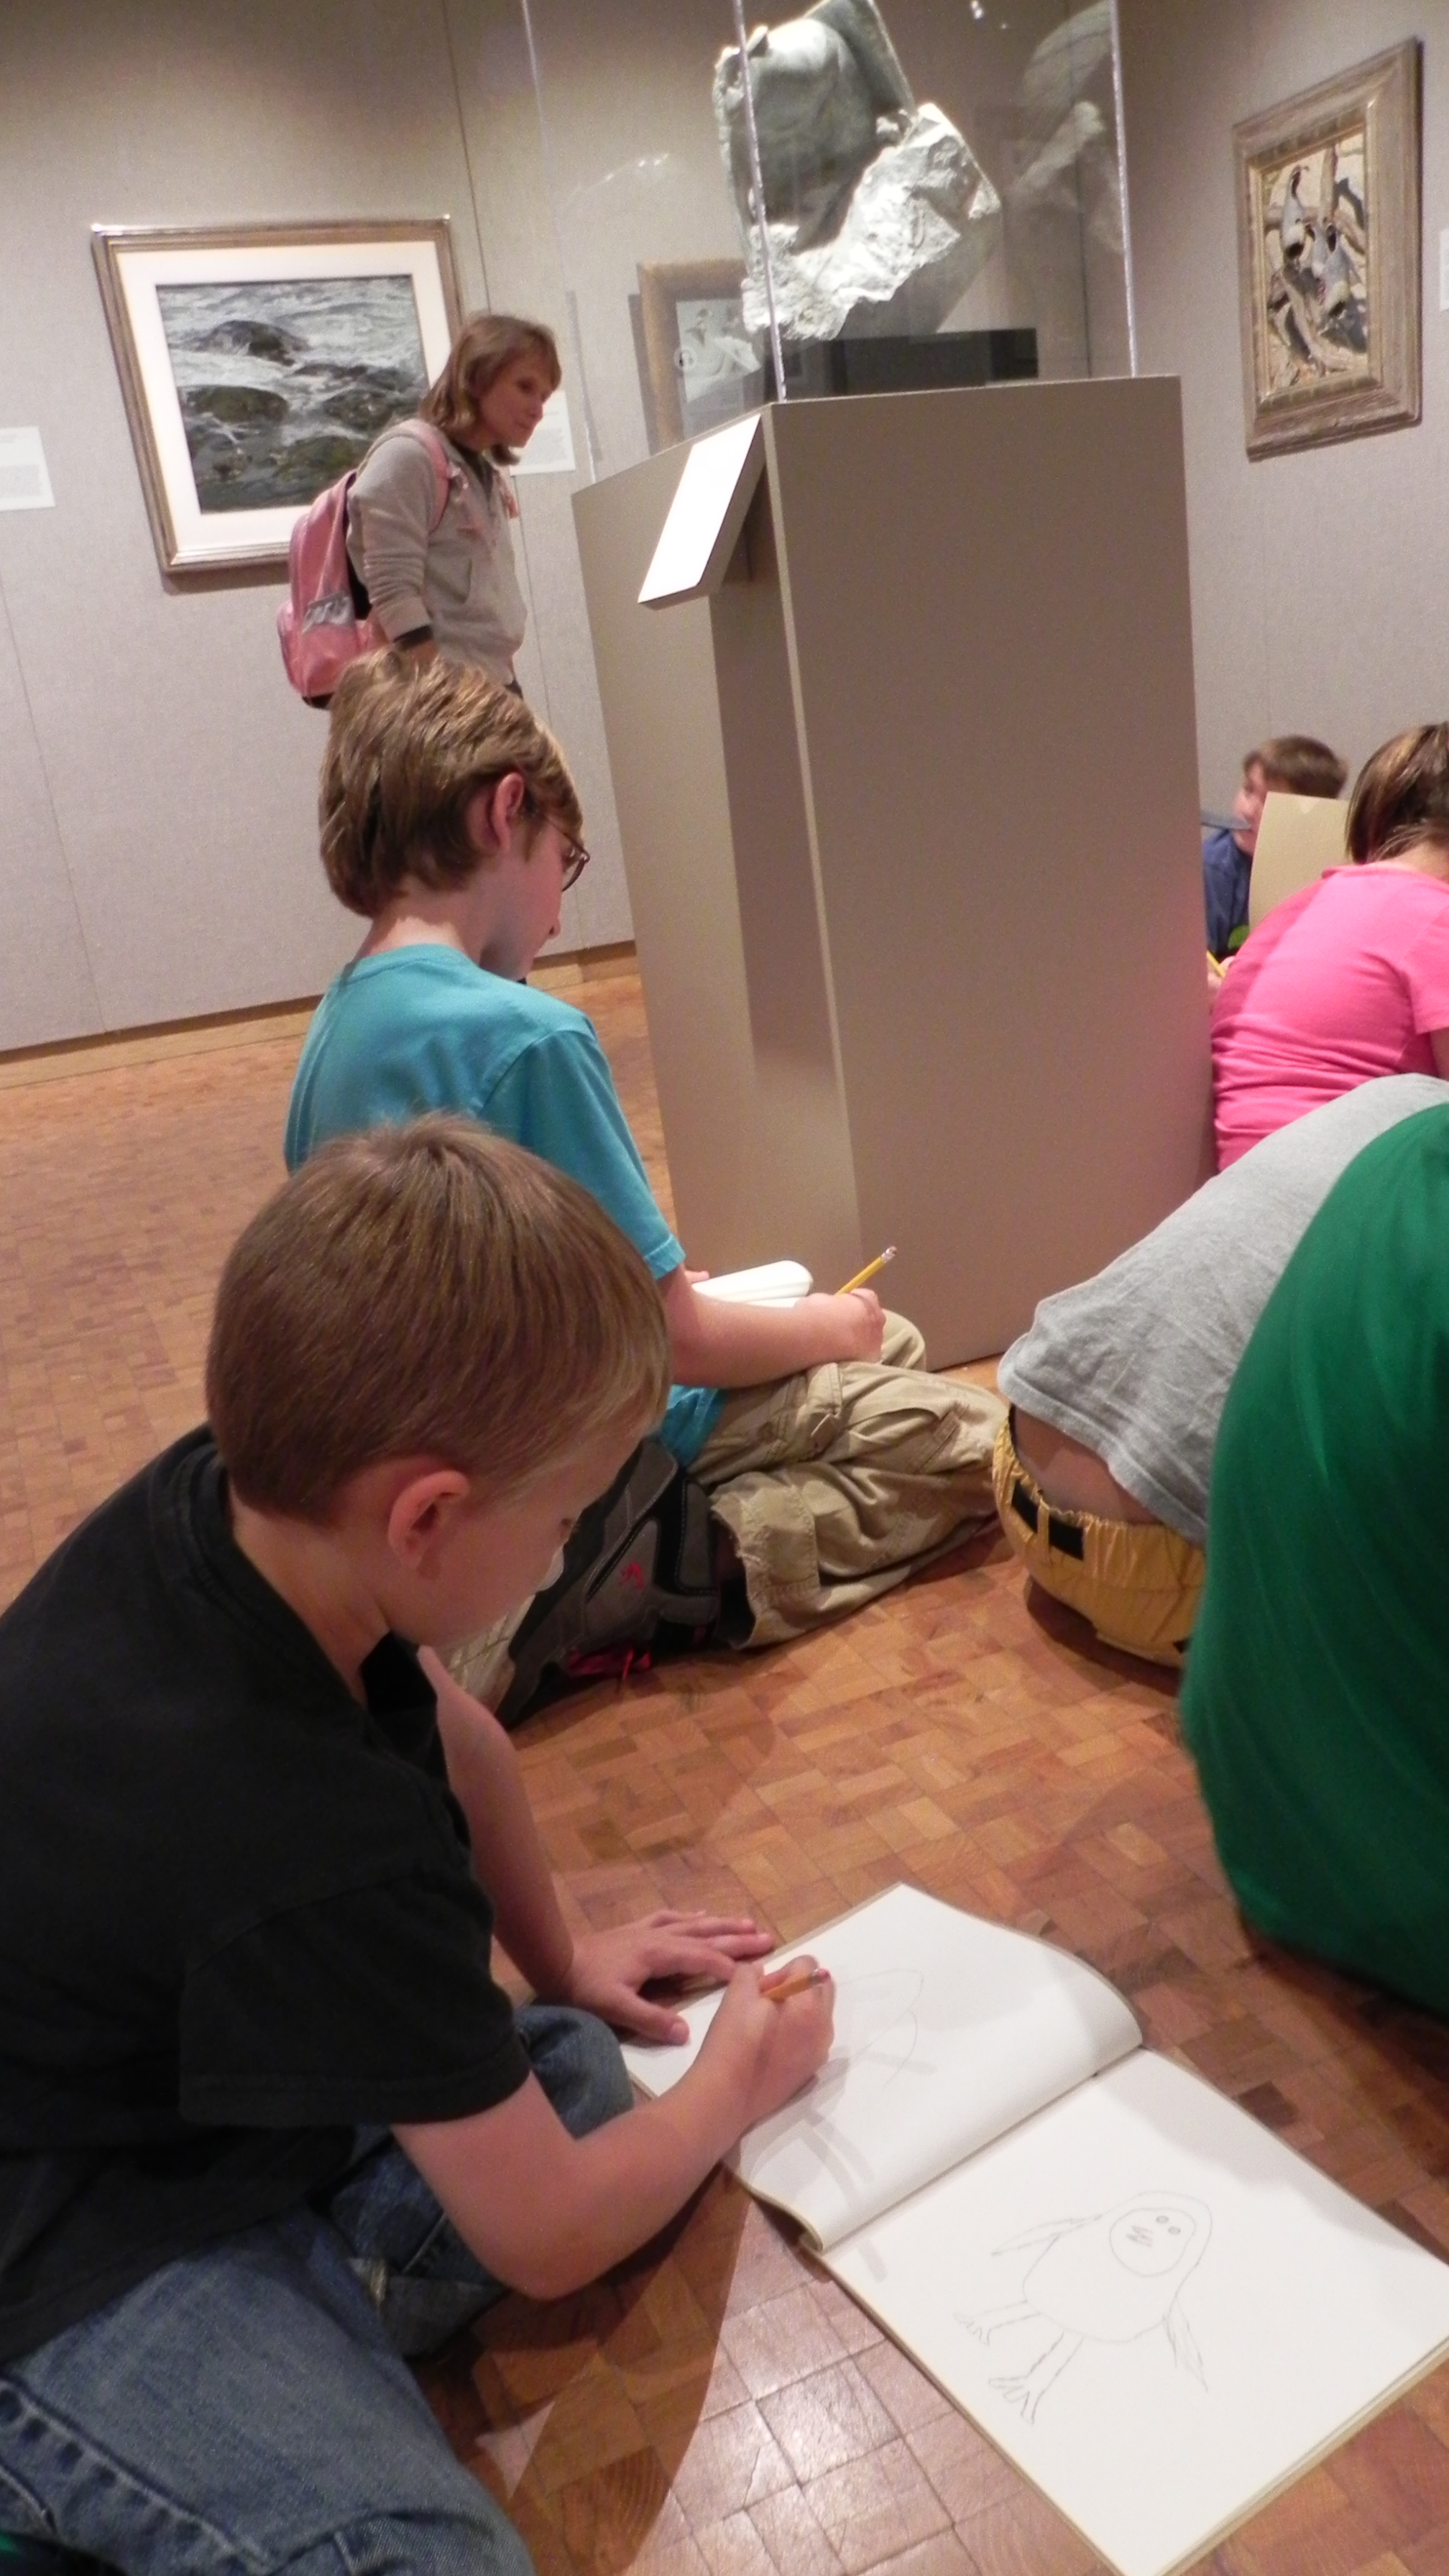 Children draw in sketchbooks in the galleries.